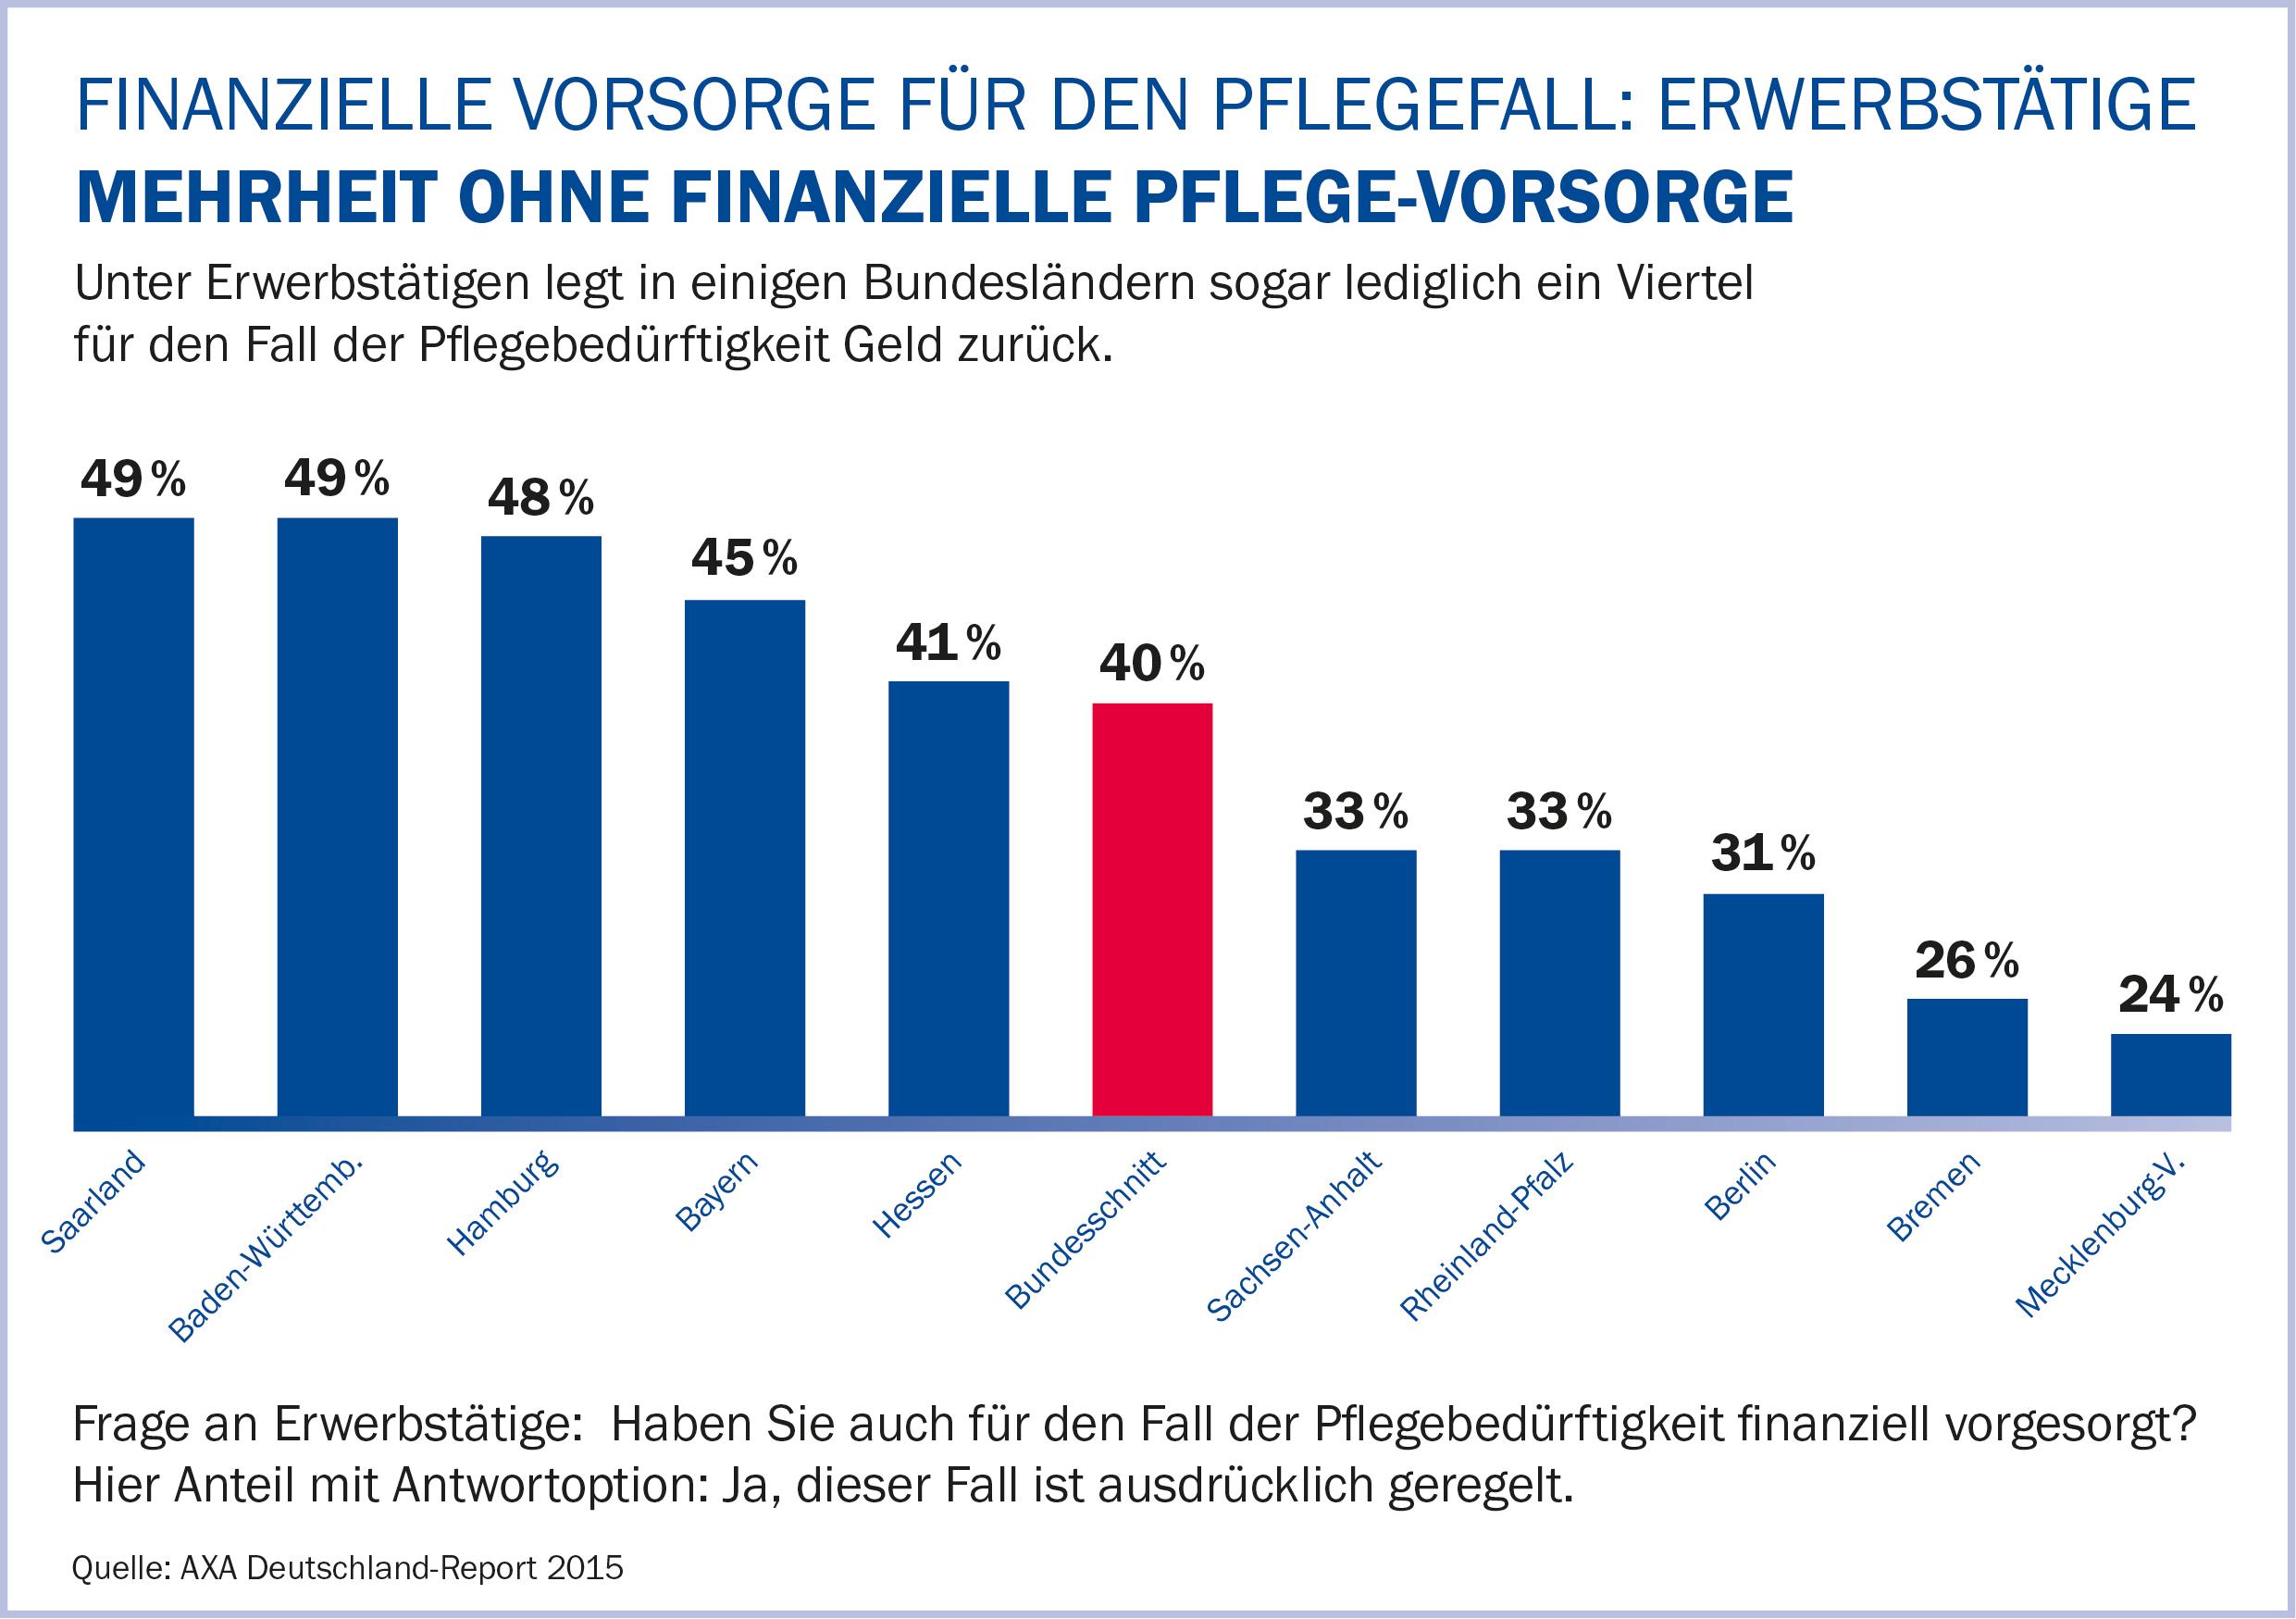 AXA Deutschland Report- Erwerbstätige_AXA